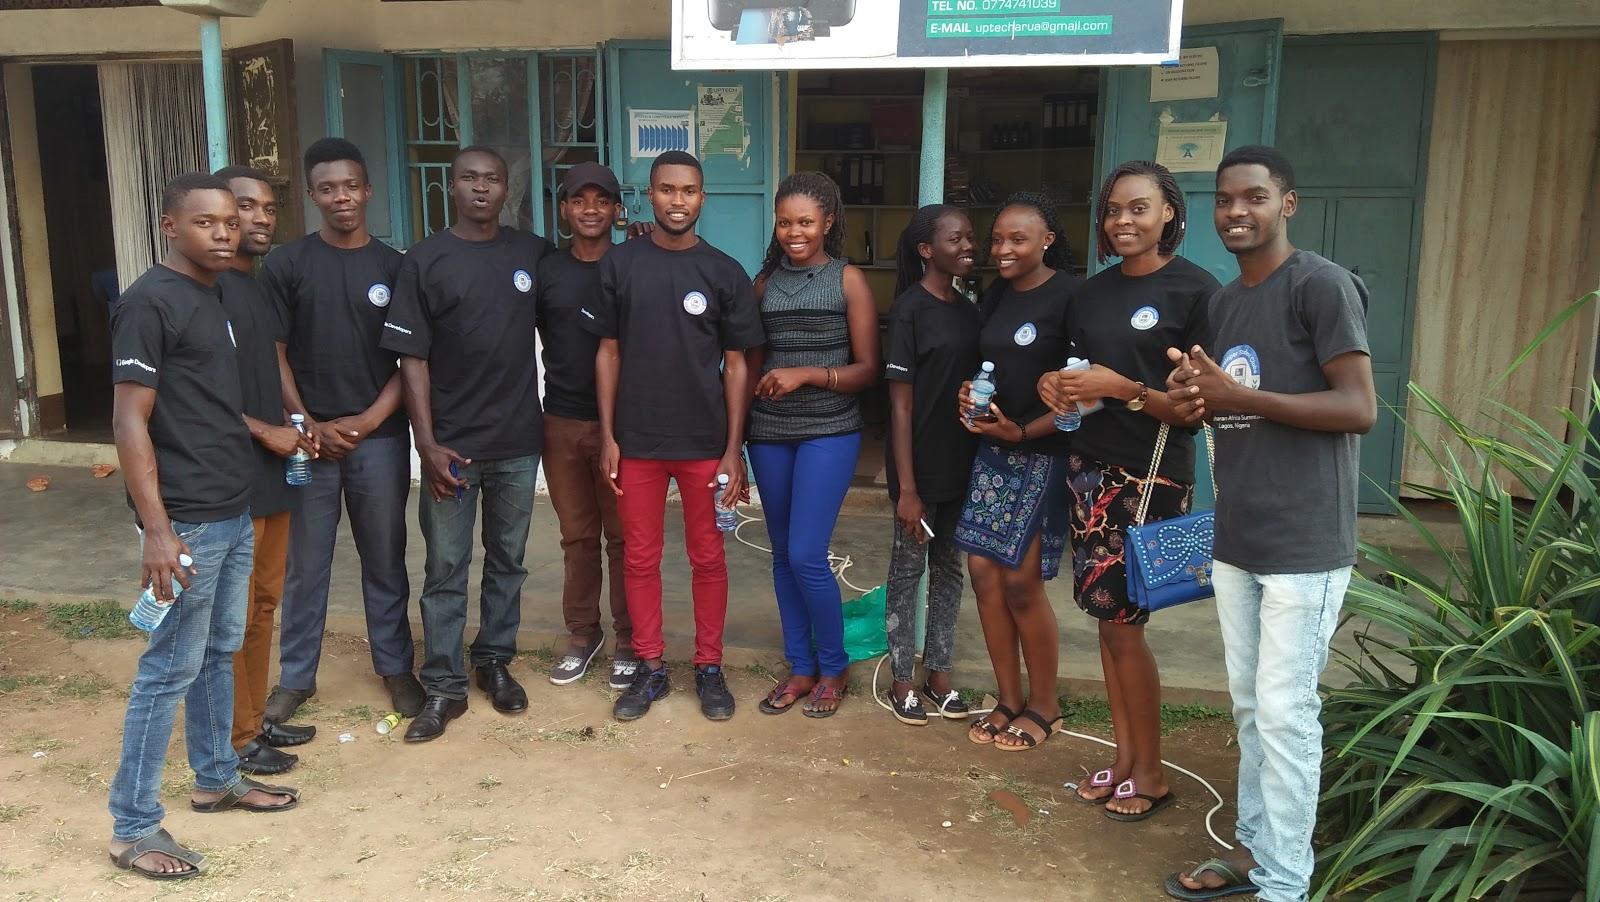 Team photo of Developer Student Club